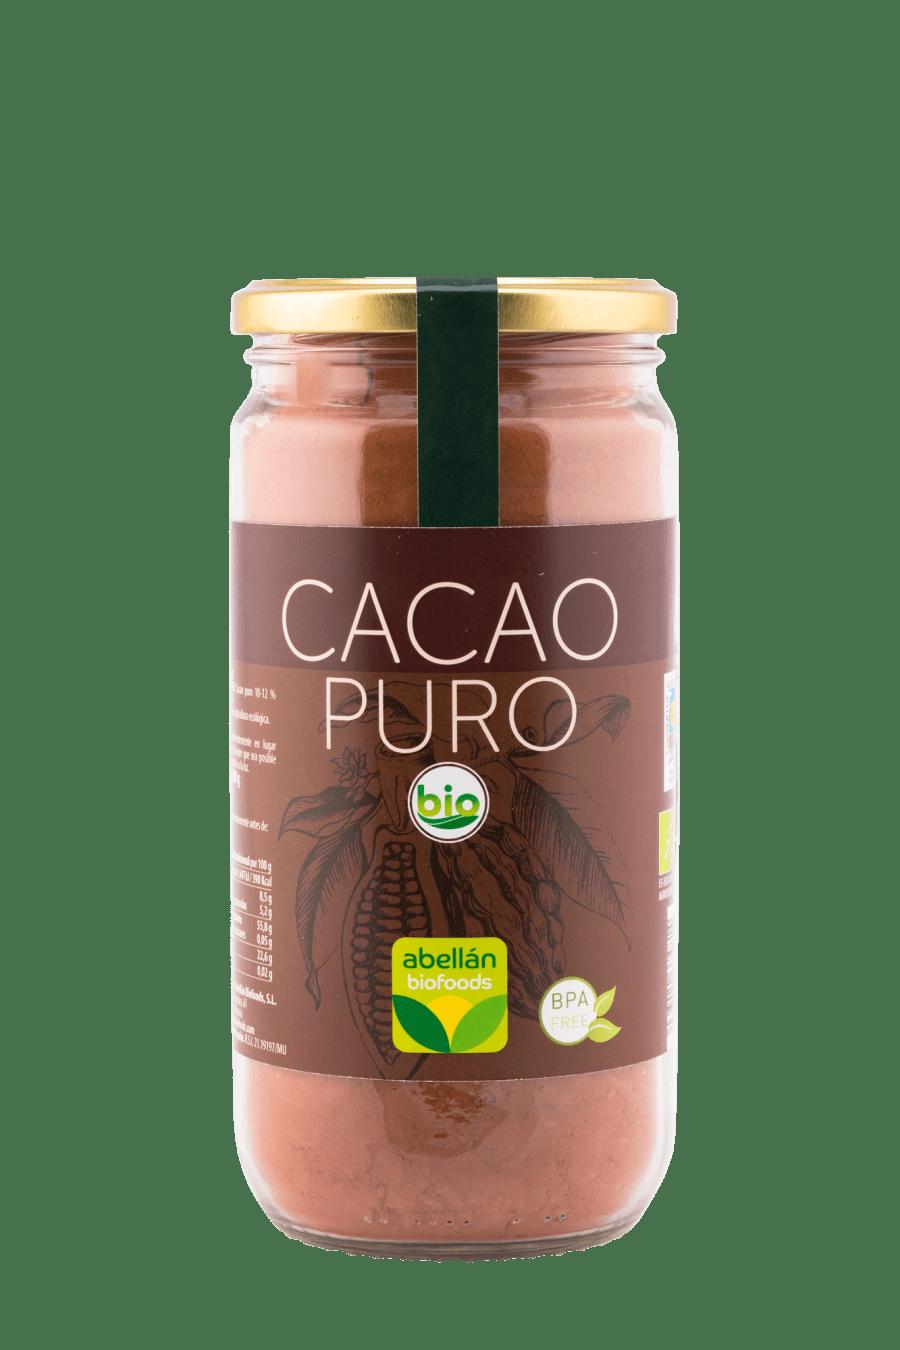 Cacao puro